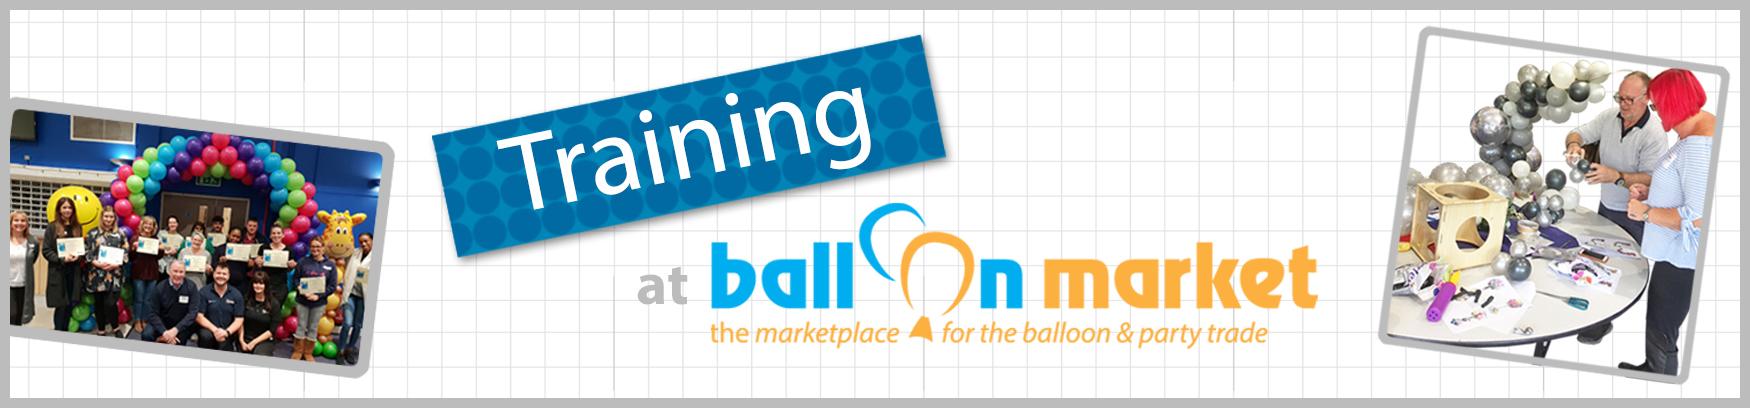 Training at Balloon Market image